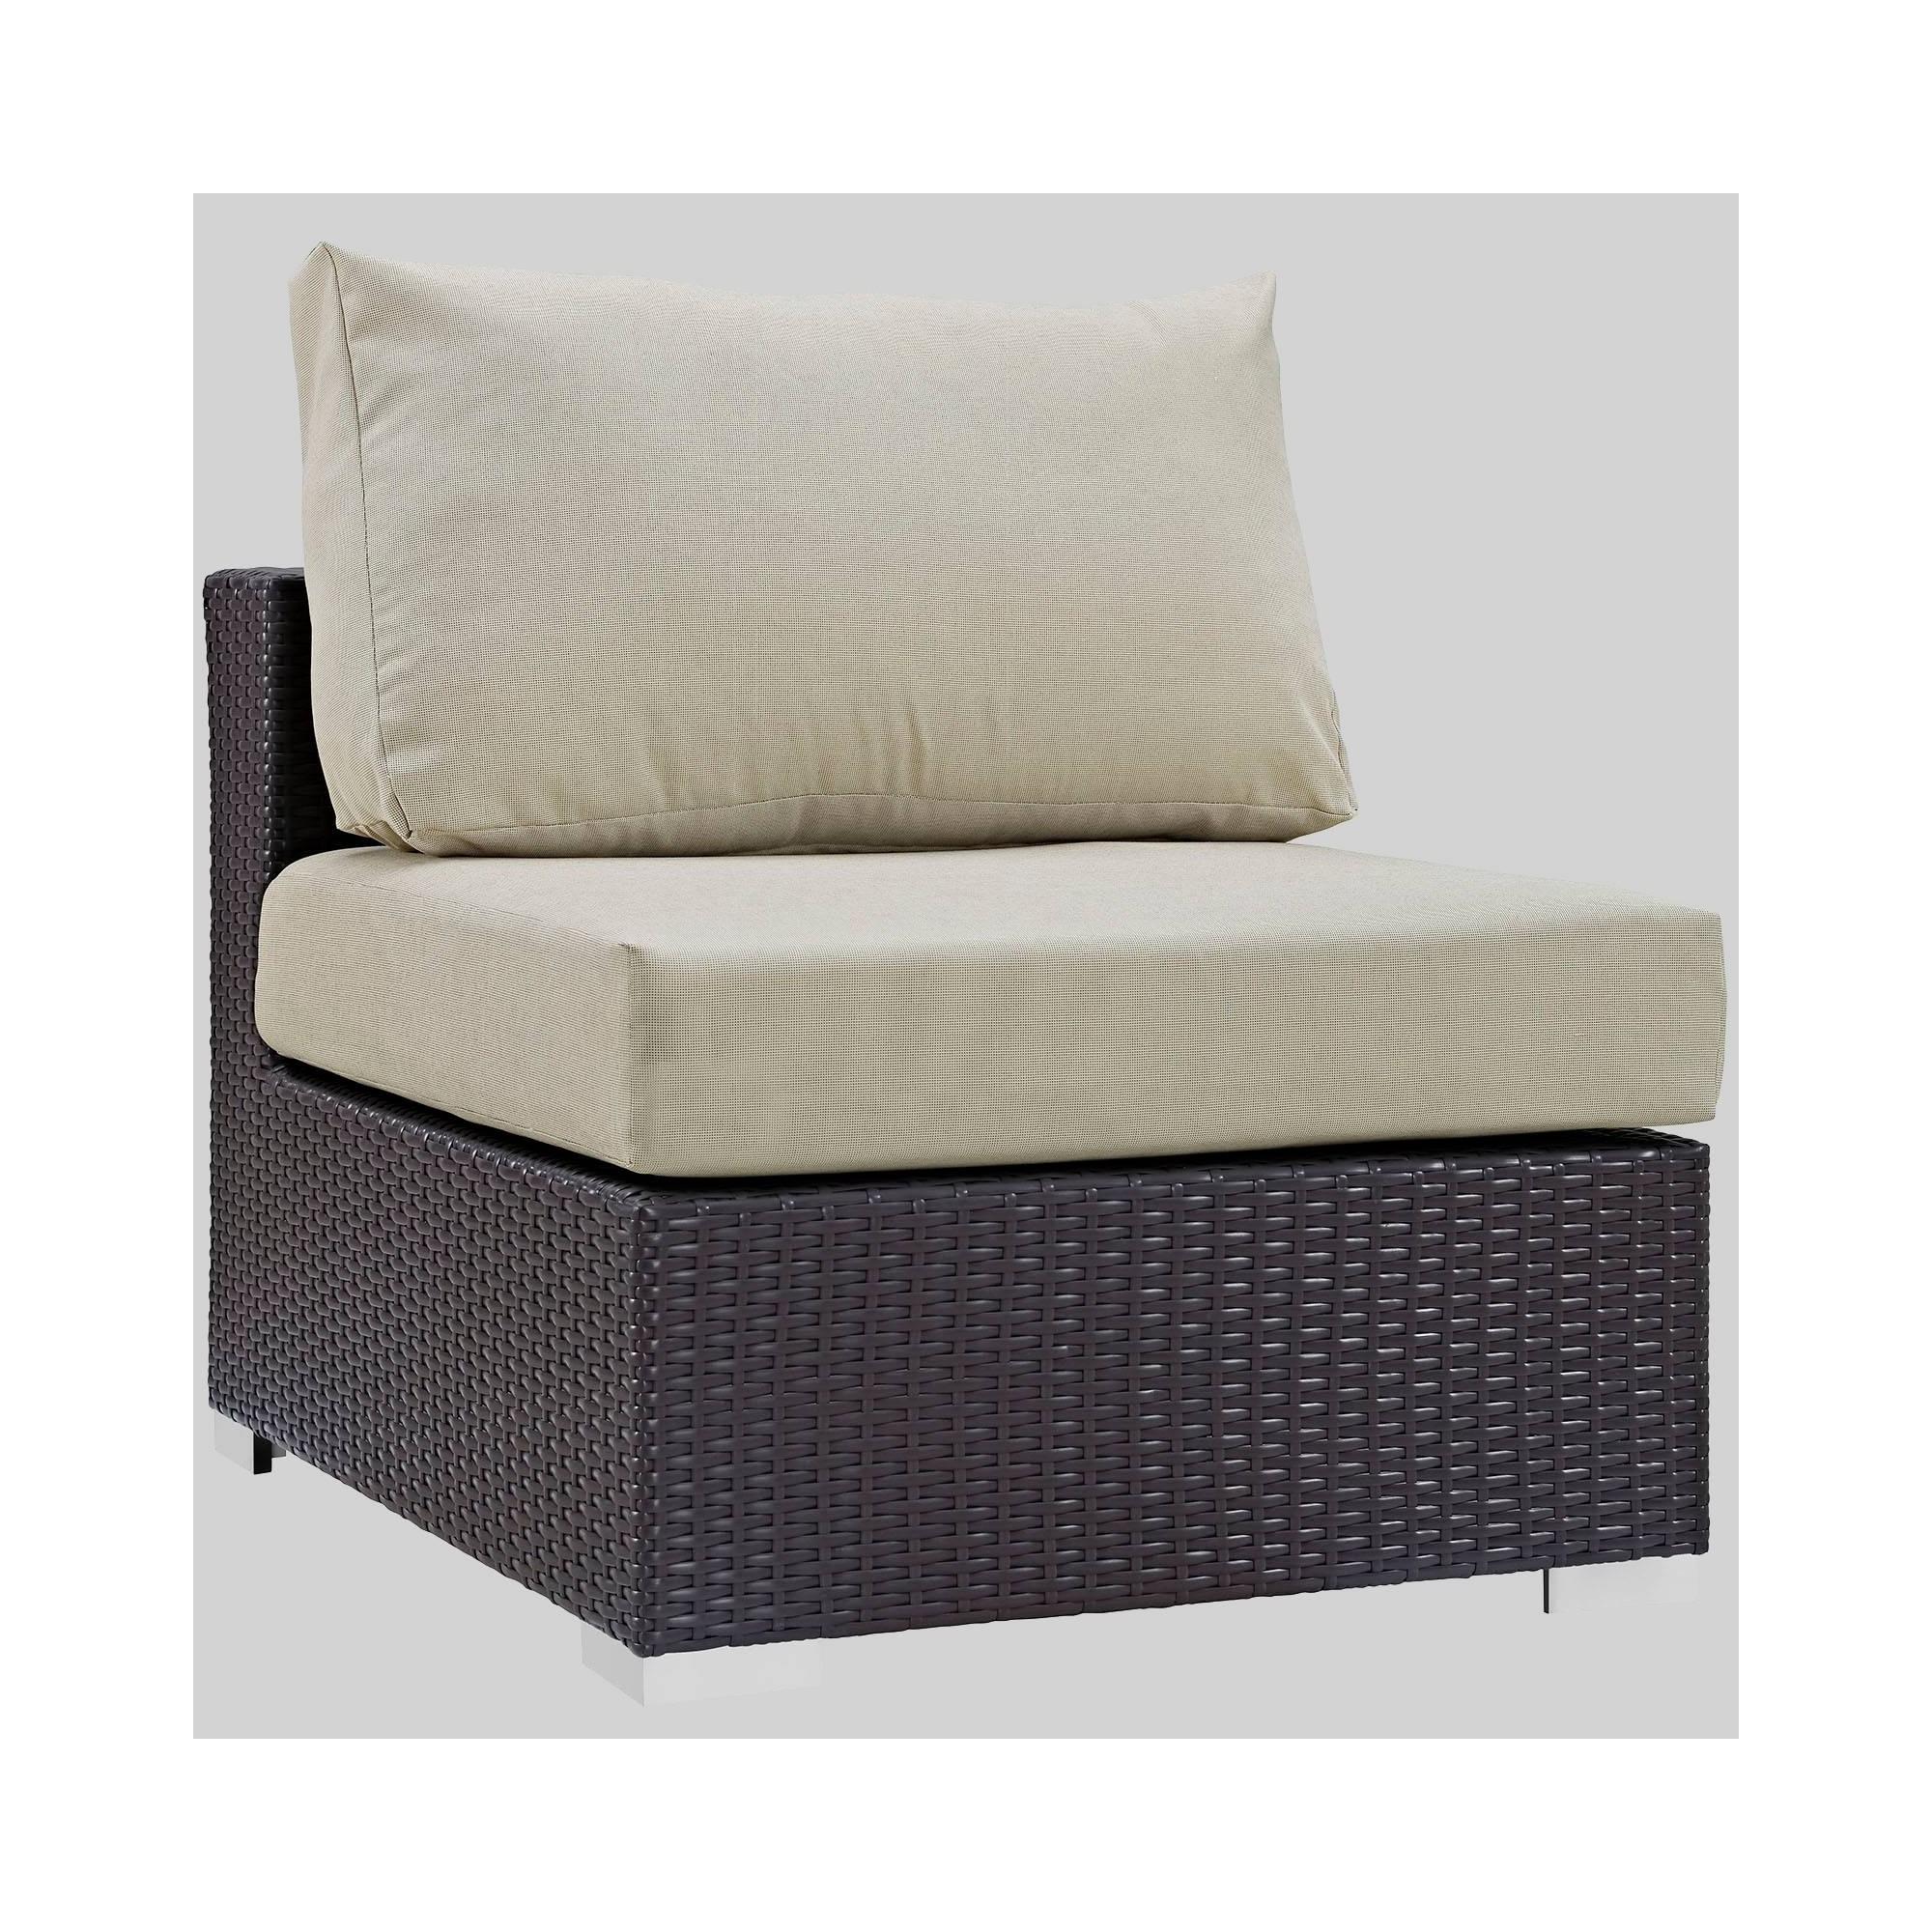 Convene Outdoor Patio Armless Chair - Beige - Modway